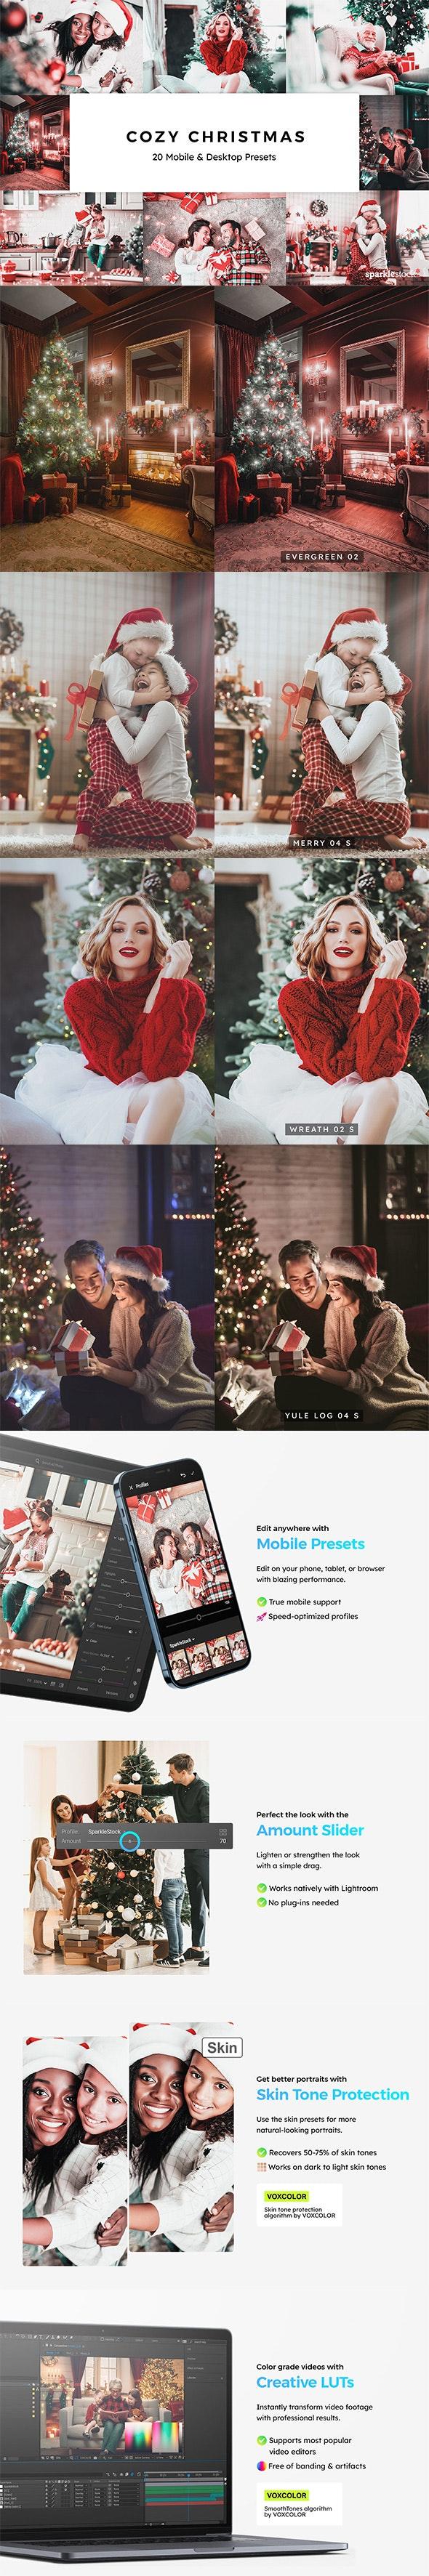 20 Cozy Christmas Lightroom Presets & LUTs - Lightroom Presets Add-ons